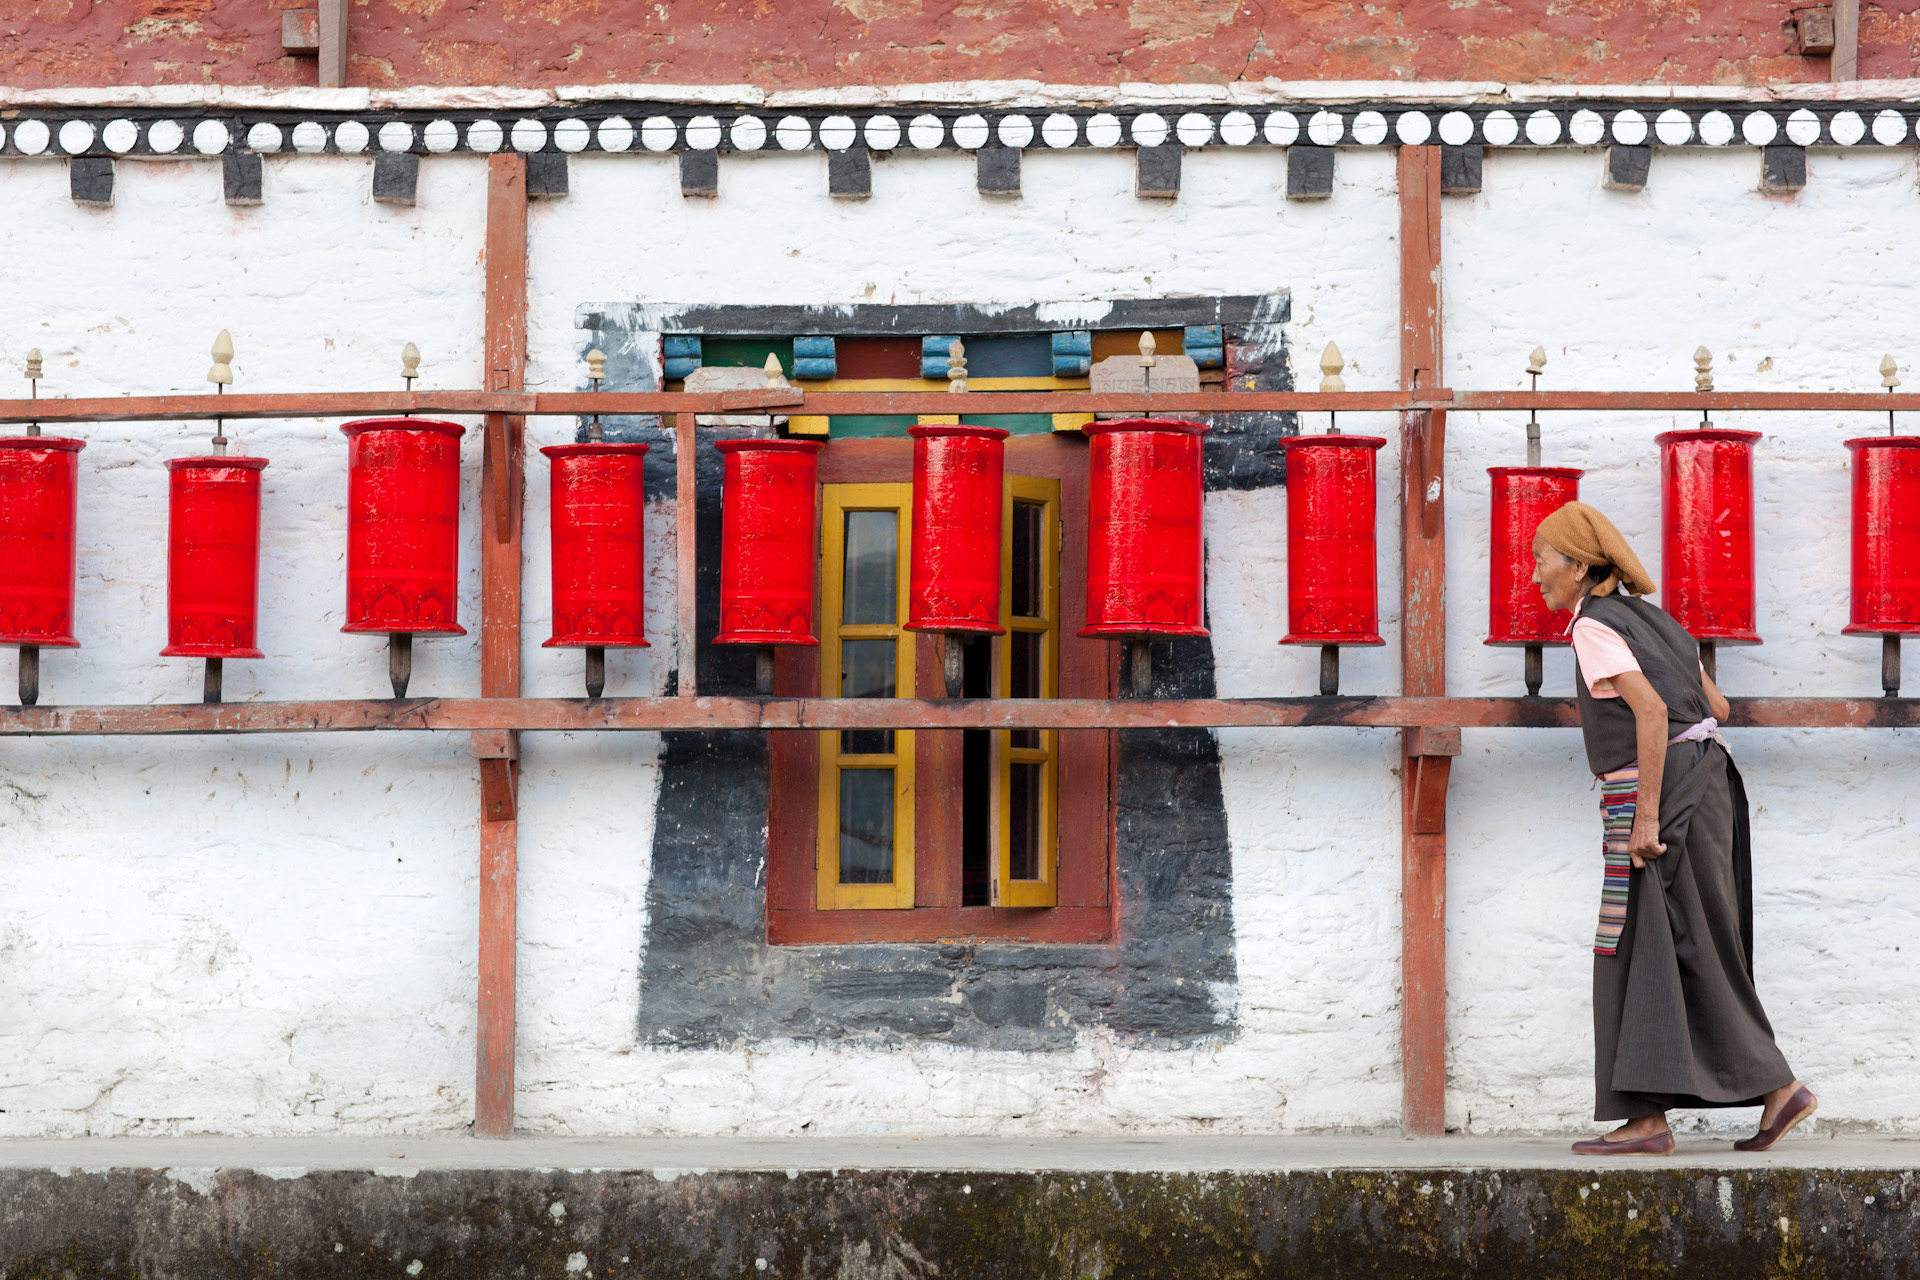 India-Sikkim-Travel-Tashiding-Monastery-Prayer-Wheels-Woman-Jason-Bax.JPG